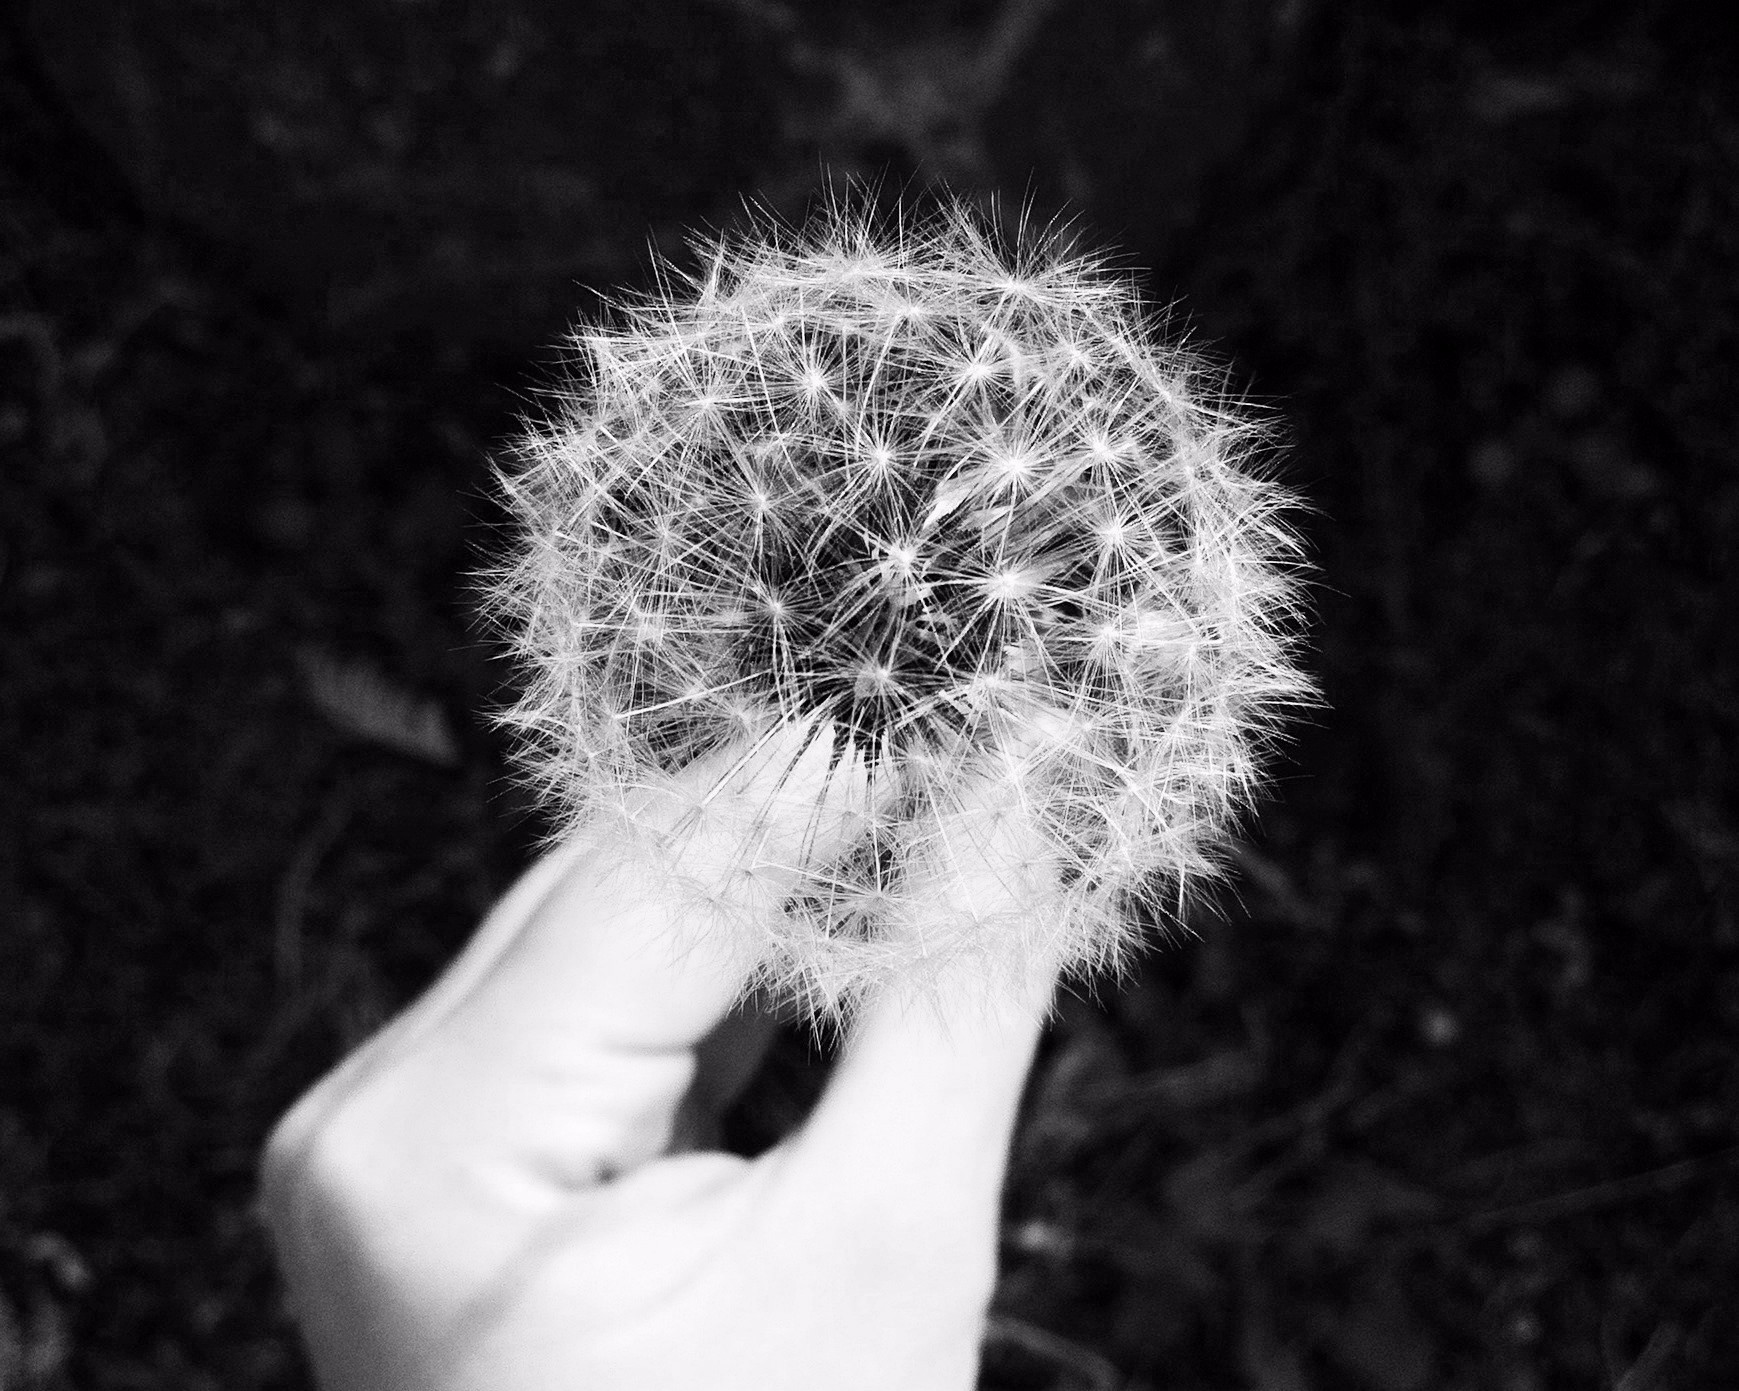 dandelion-692317_b&w